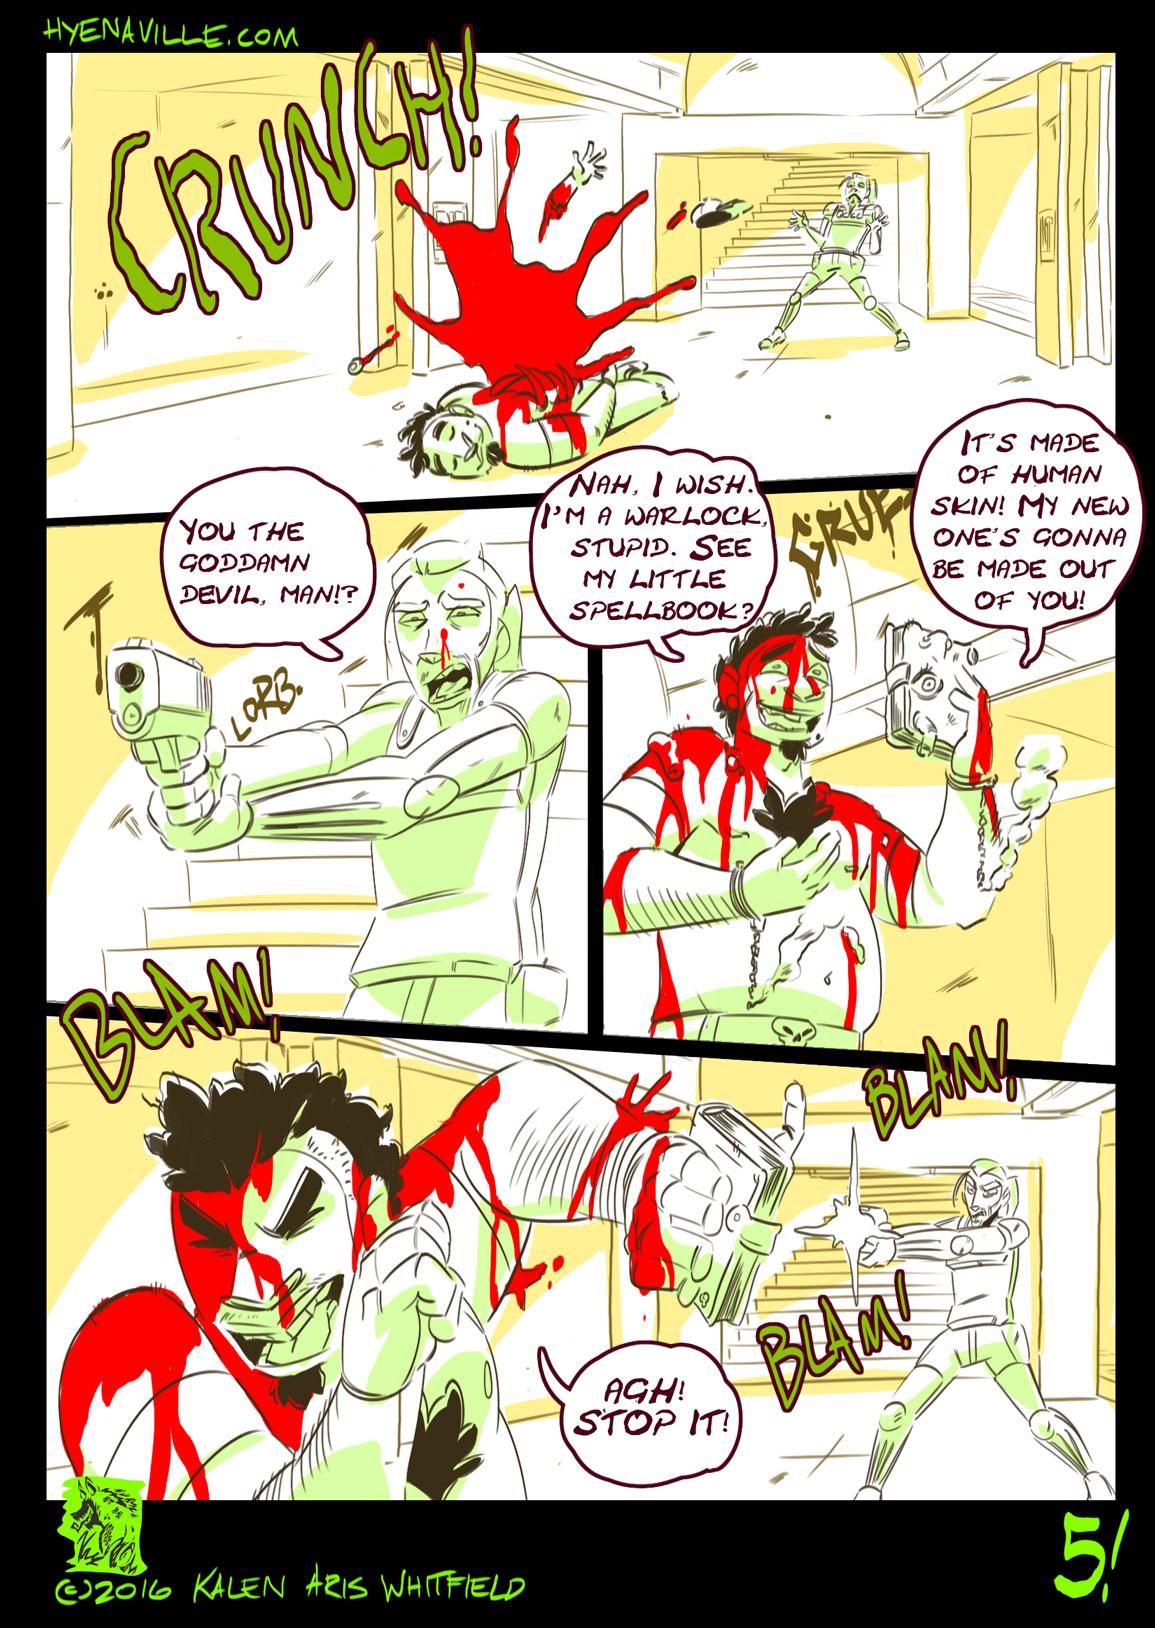 HYENAVILLE page 5